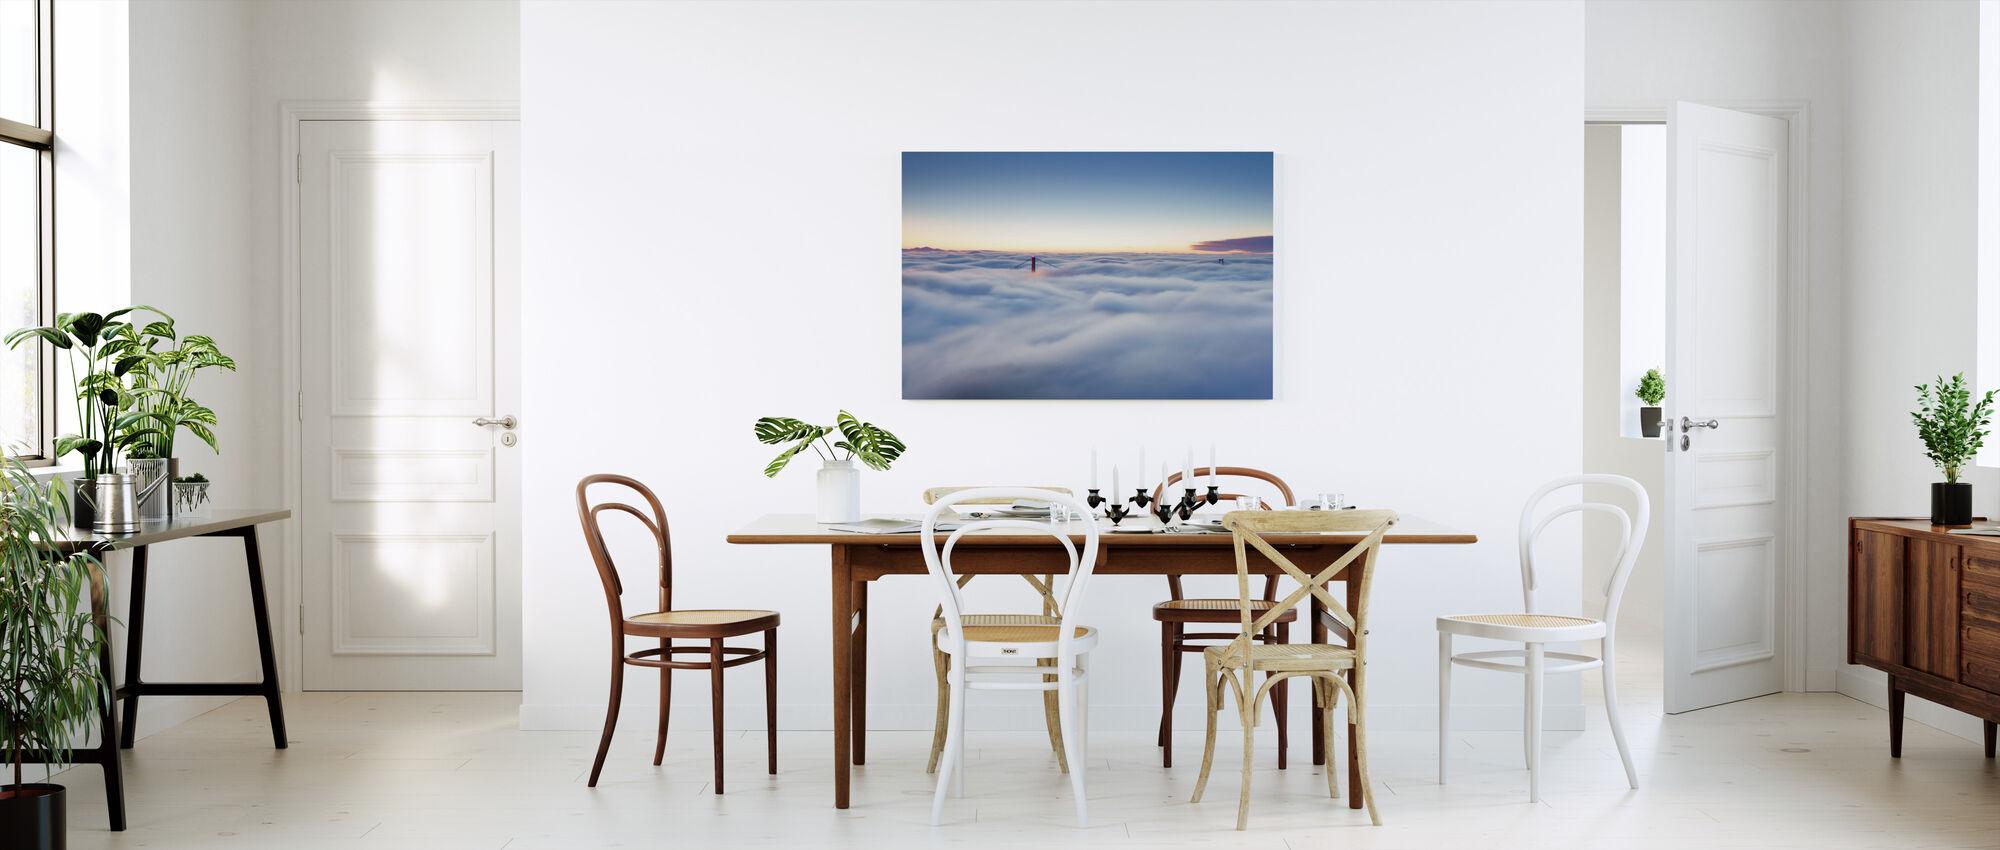 Fog over San Francisco - Canvas print - Kitchen